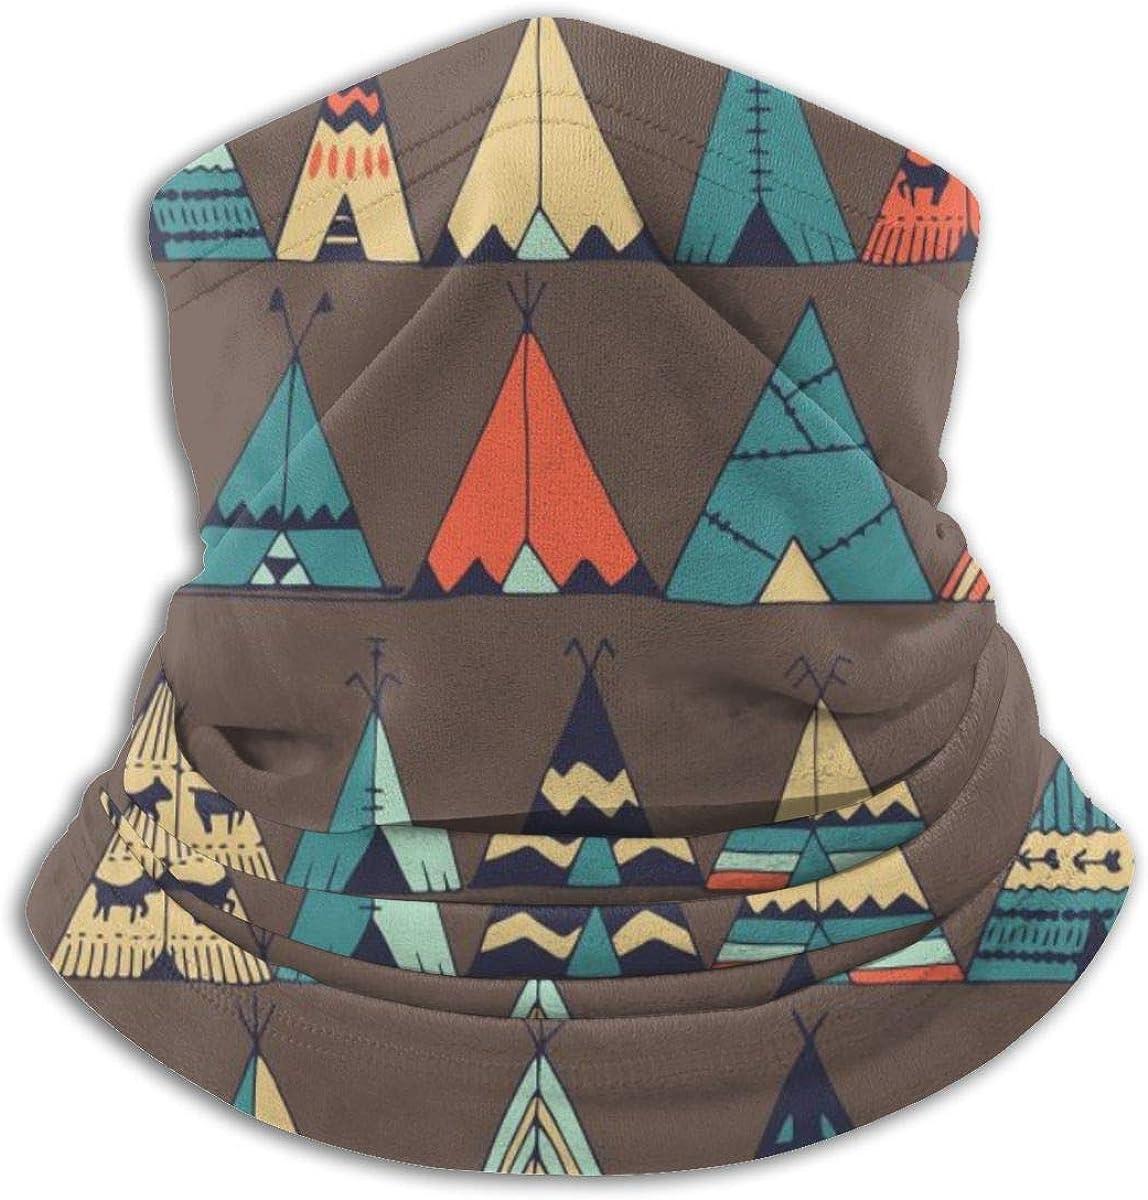 Cute Cartoon Teepee Native American Summer Tent Half Face Mask Balaclava Neck Gaiter Winter Ski Masks for Men Women